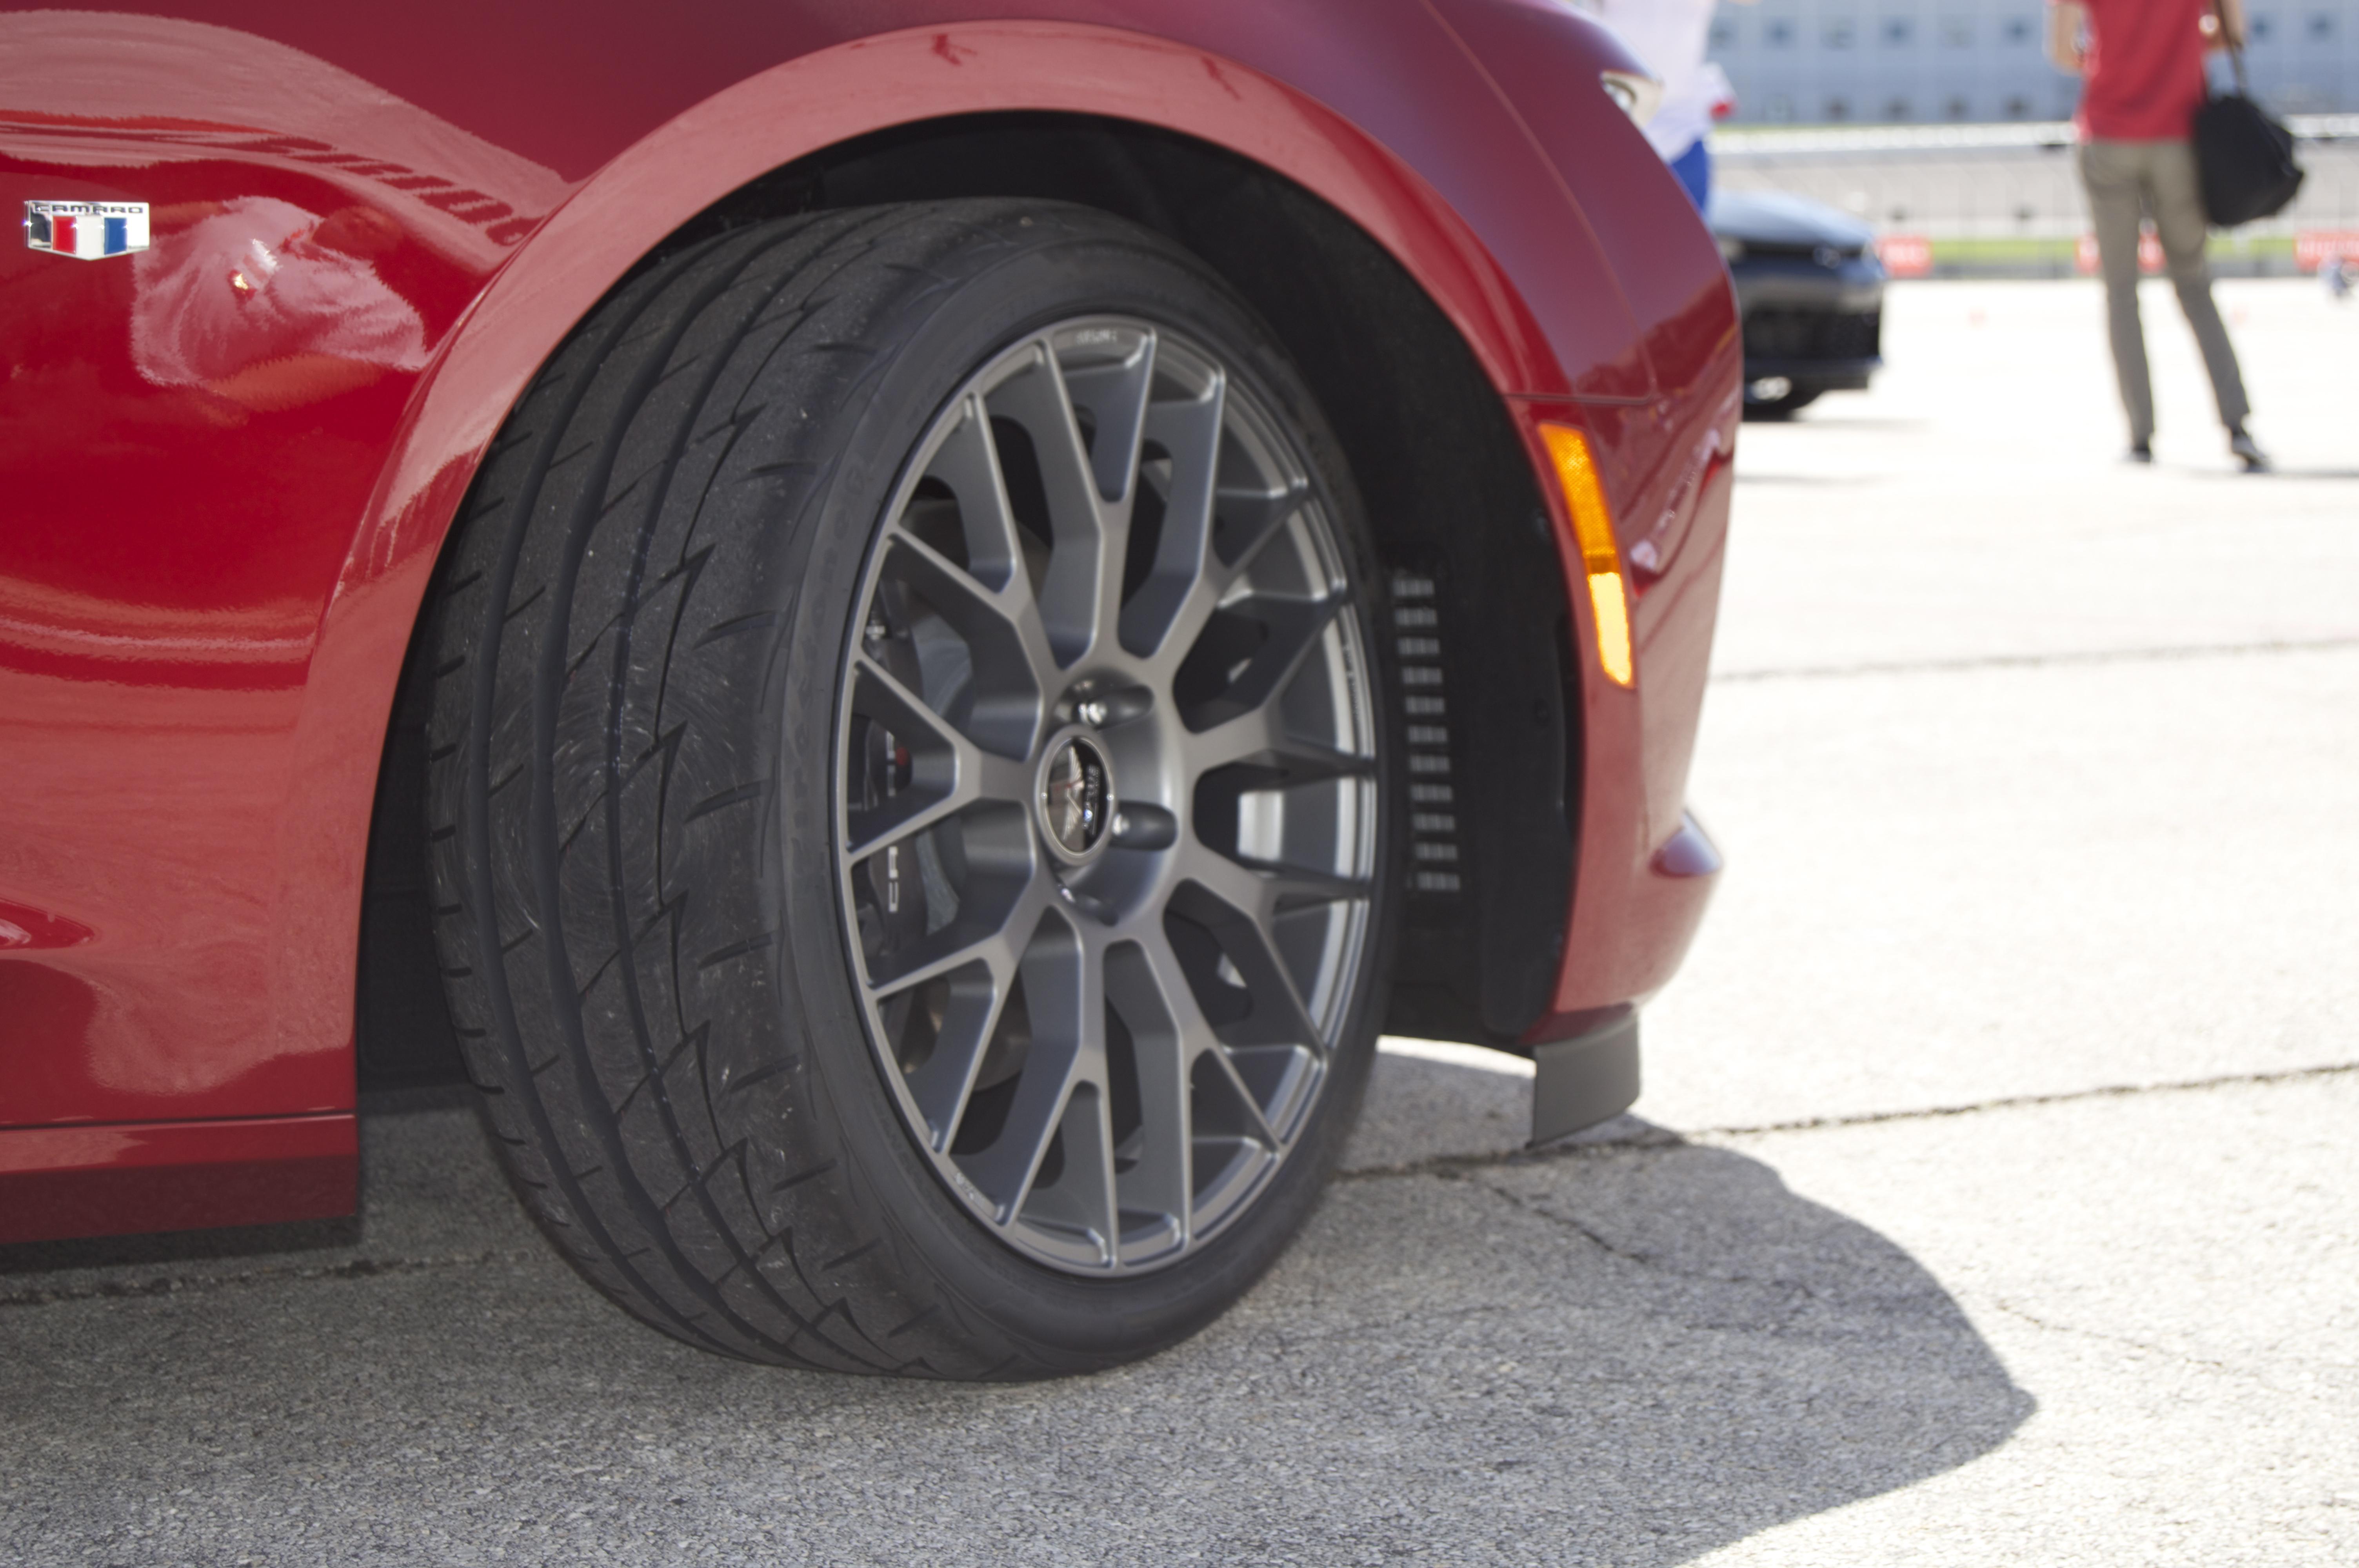 Bridgestone Refreshing Products Tire Review Magazine